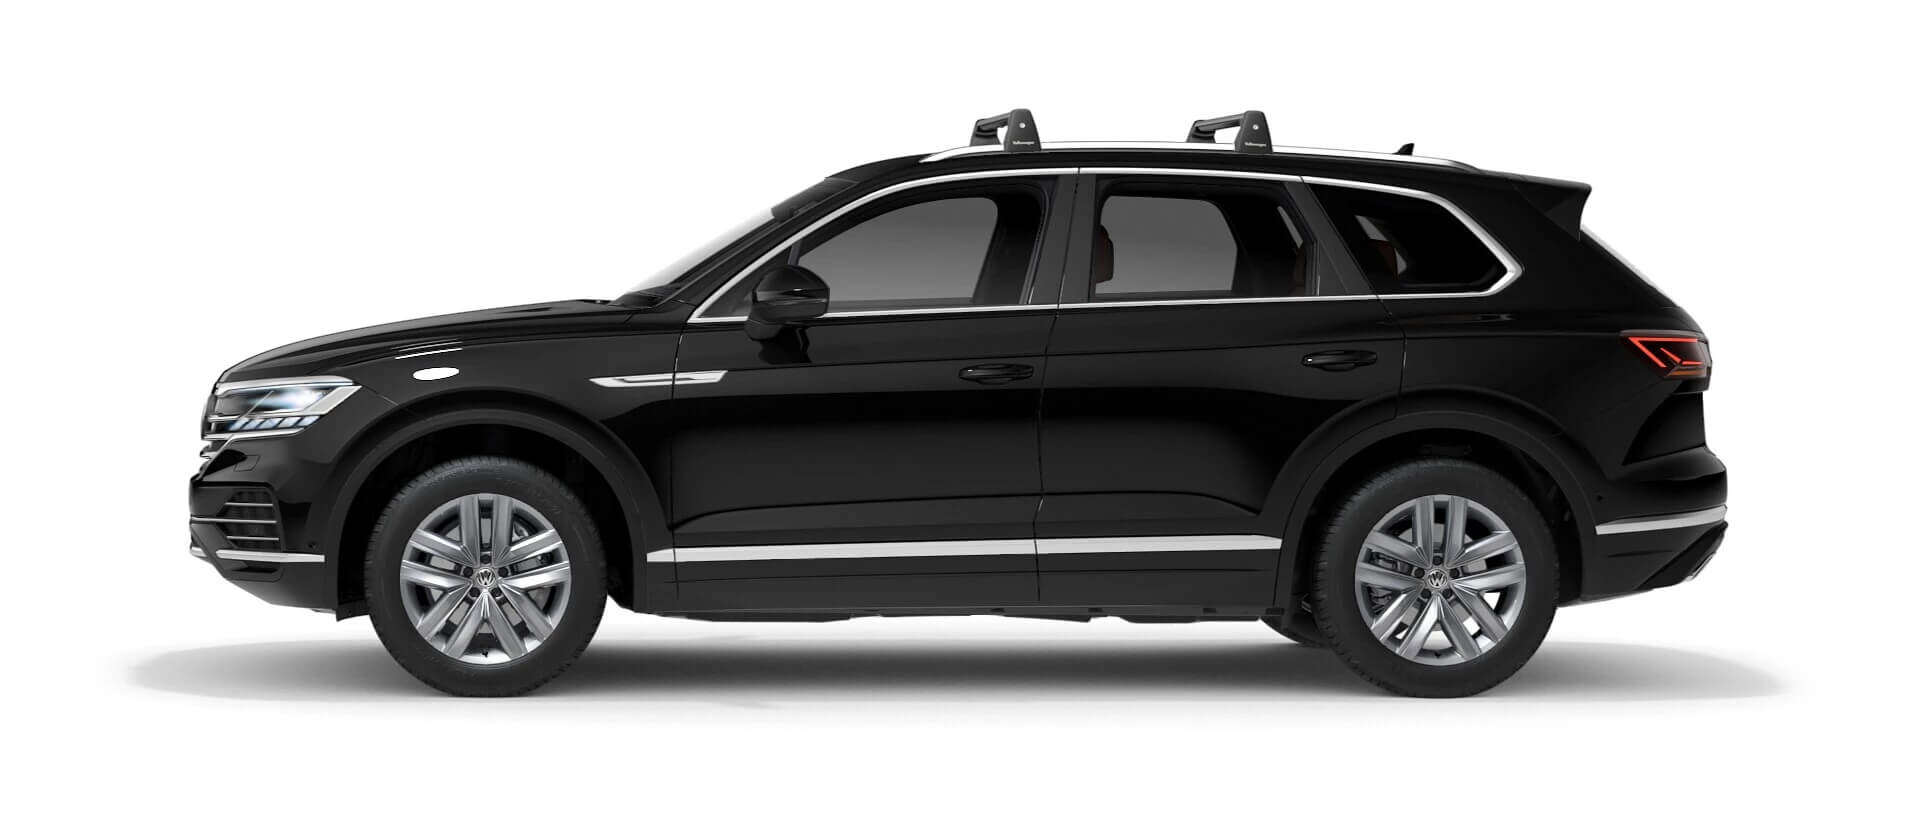 2020 Volkswagen Touareg CR 190TDi Adventure Suv